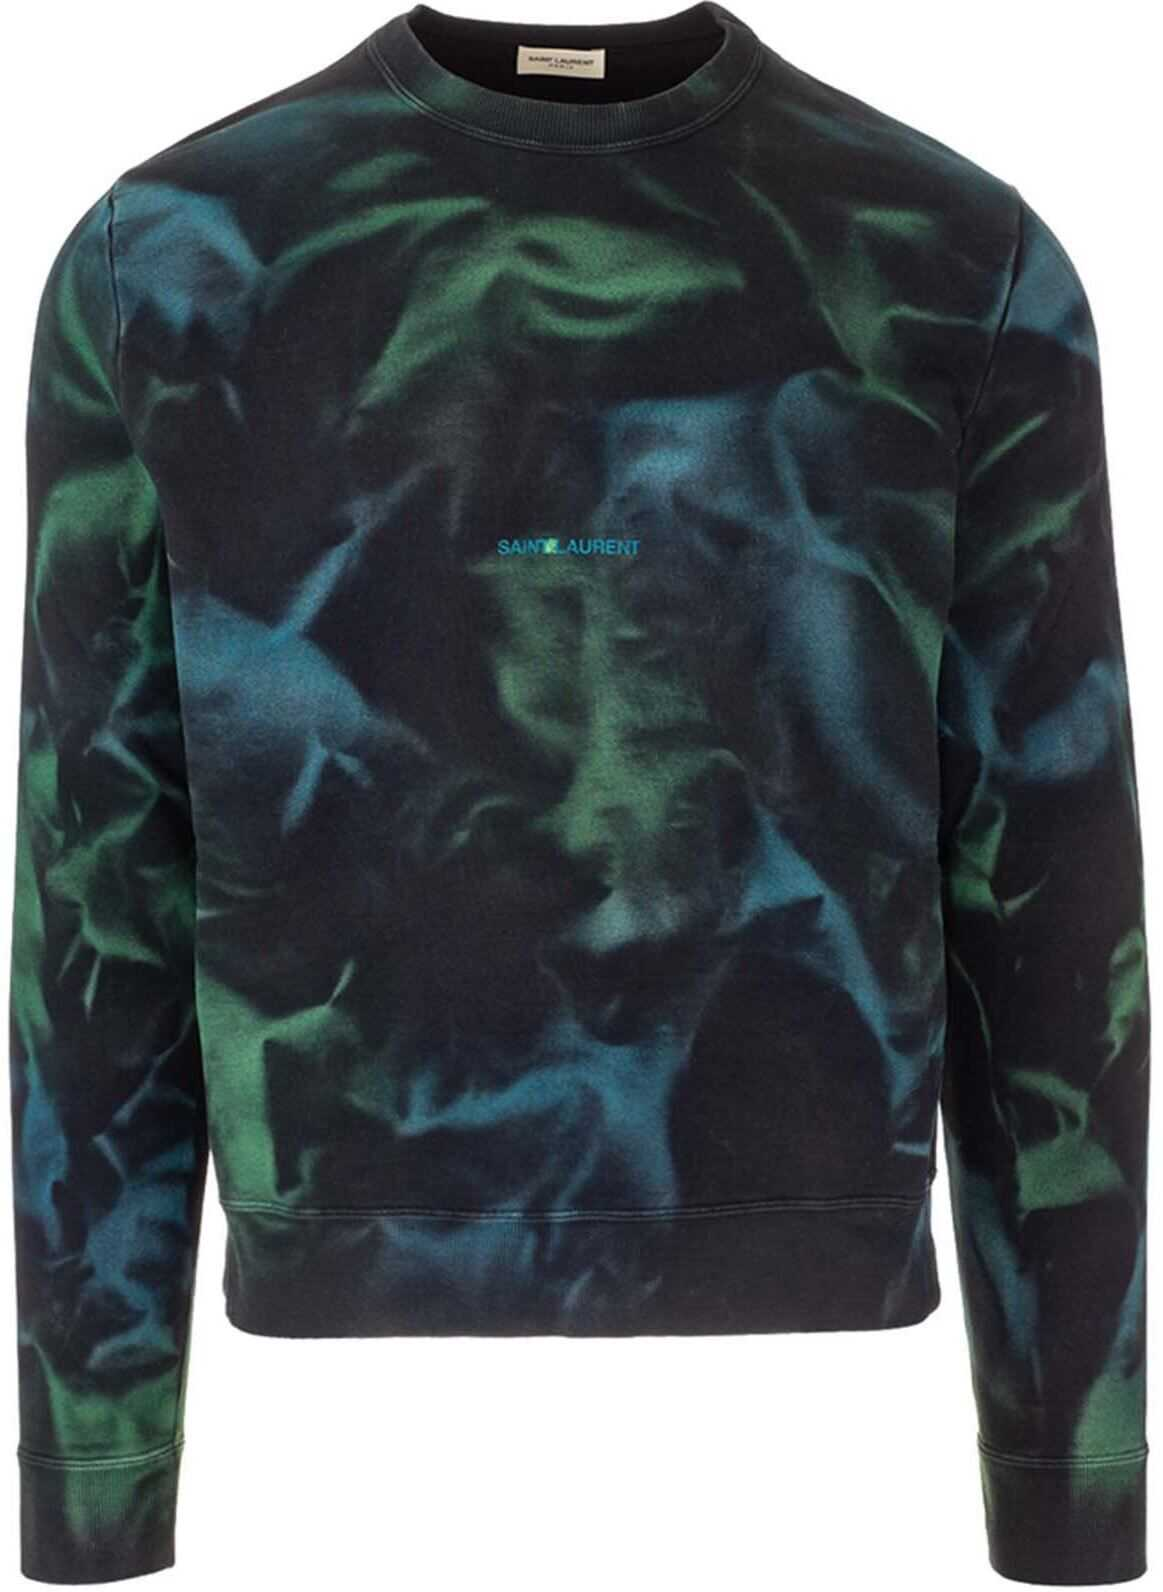 Saint Laurent Tie-Dye Crewneck Sweatshirt Multi imagine